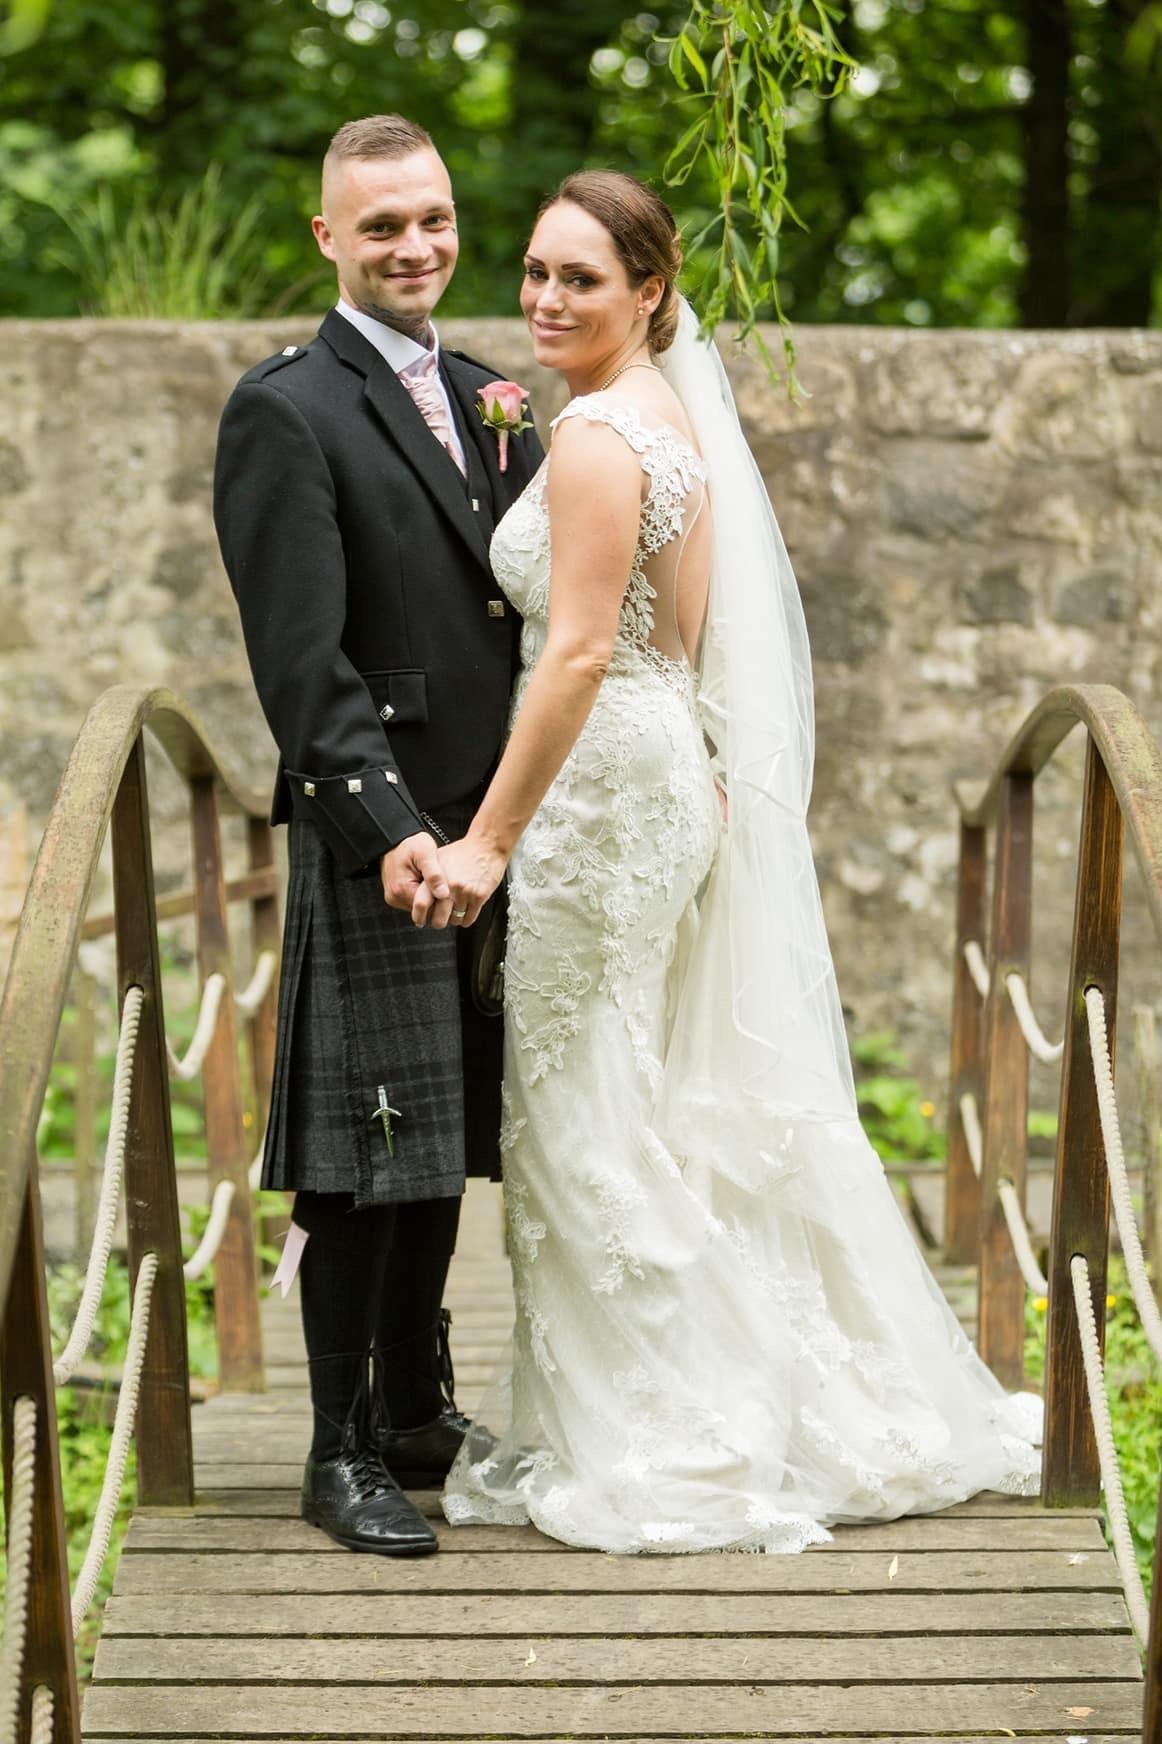 Catrina and her husband